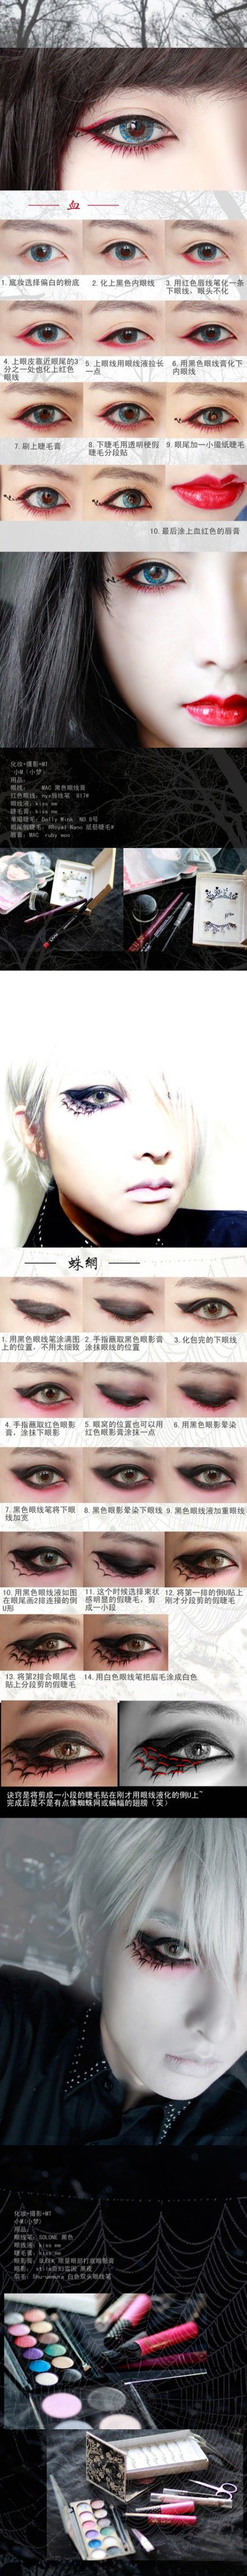 maquillaje lolita gotic                                                                                                                                                                                 More